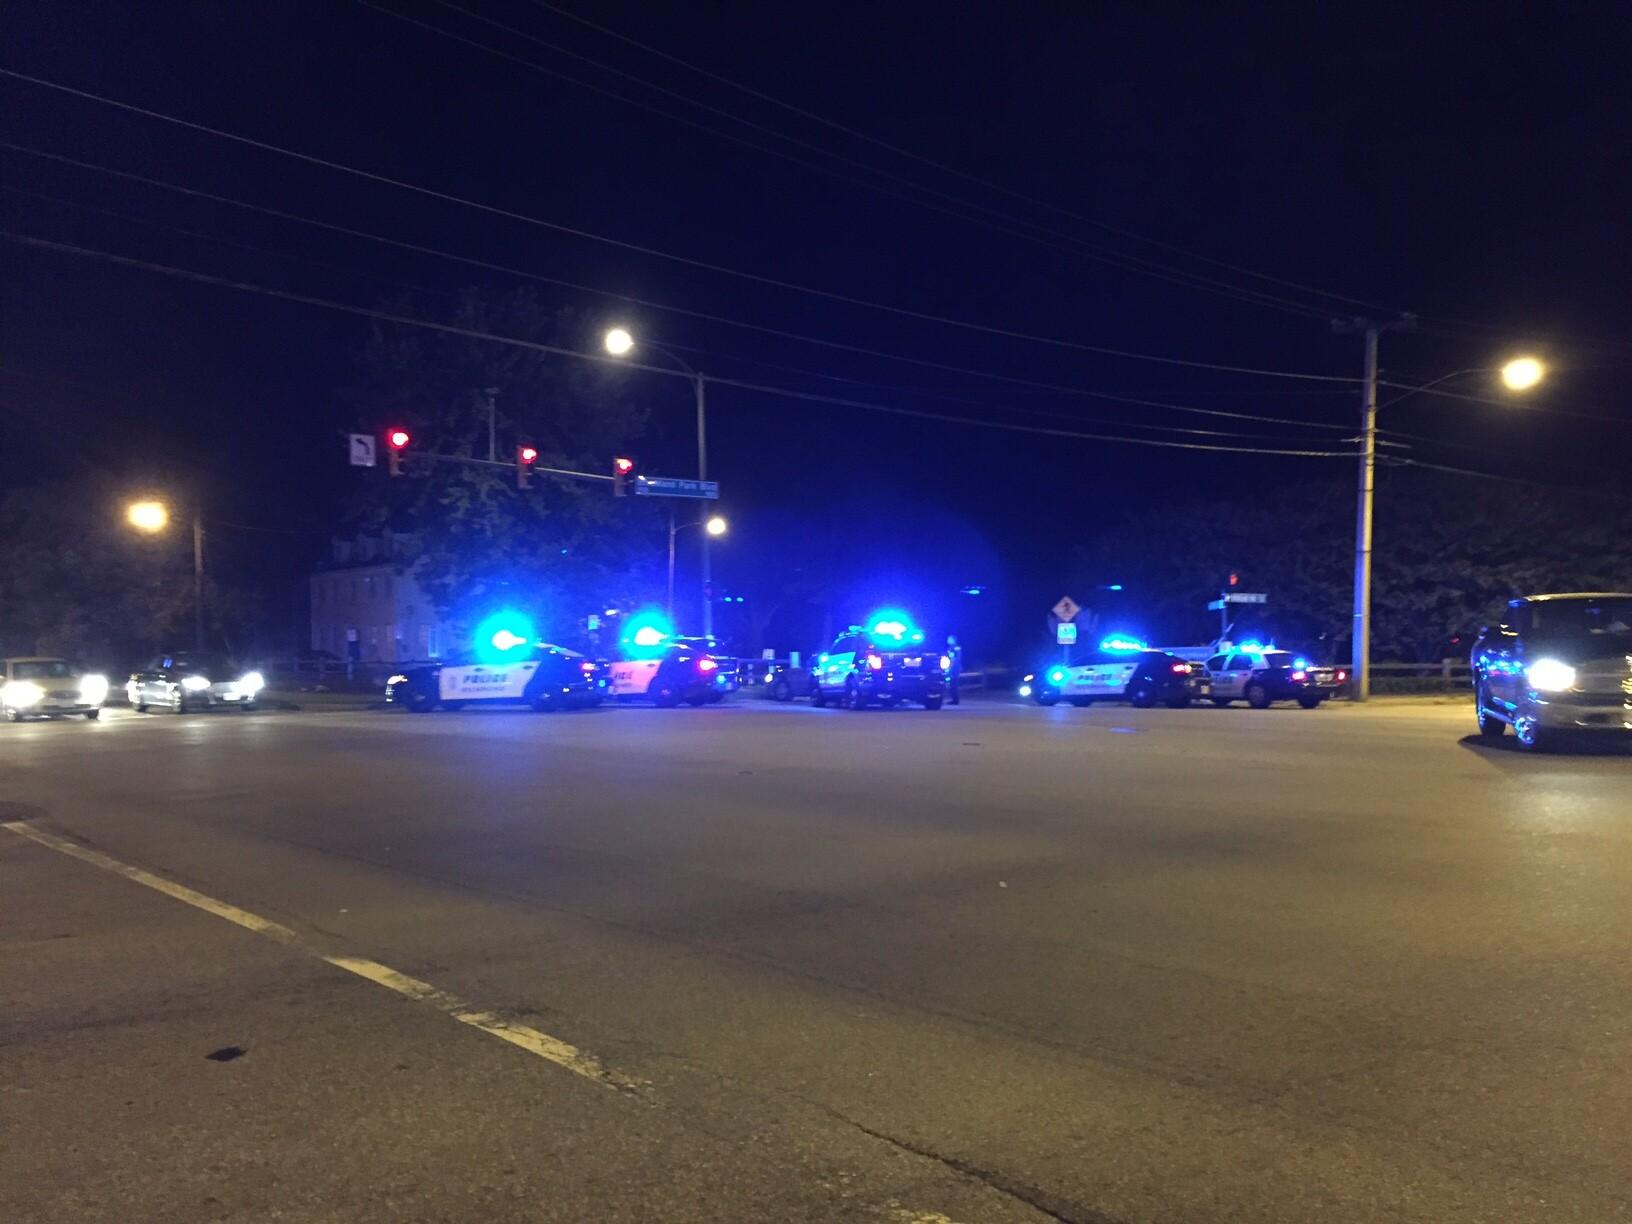 Photos: Pedestrian seriously injured after being struck by vehicle in Richmond